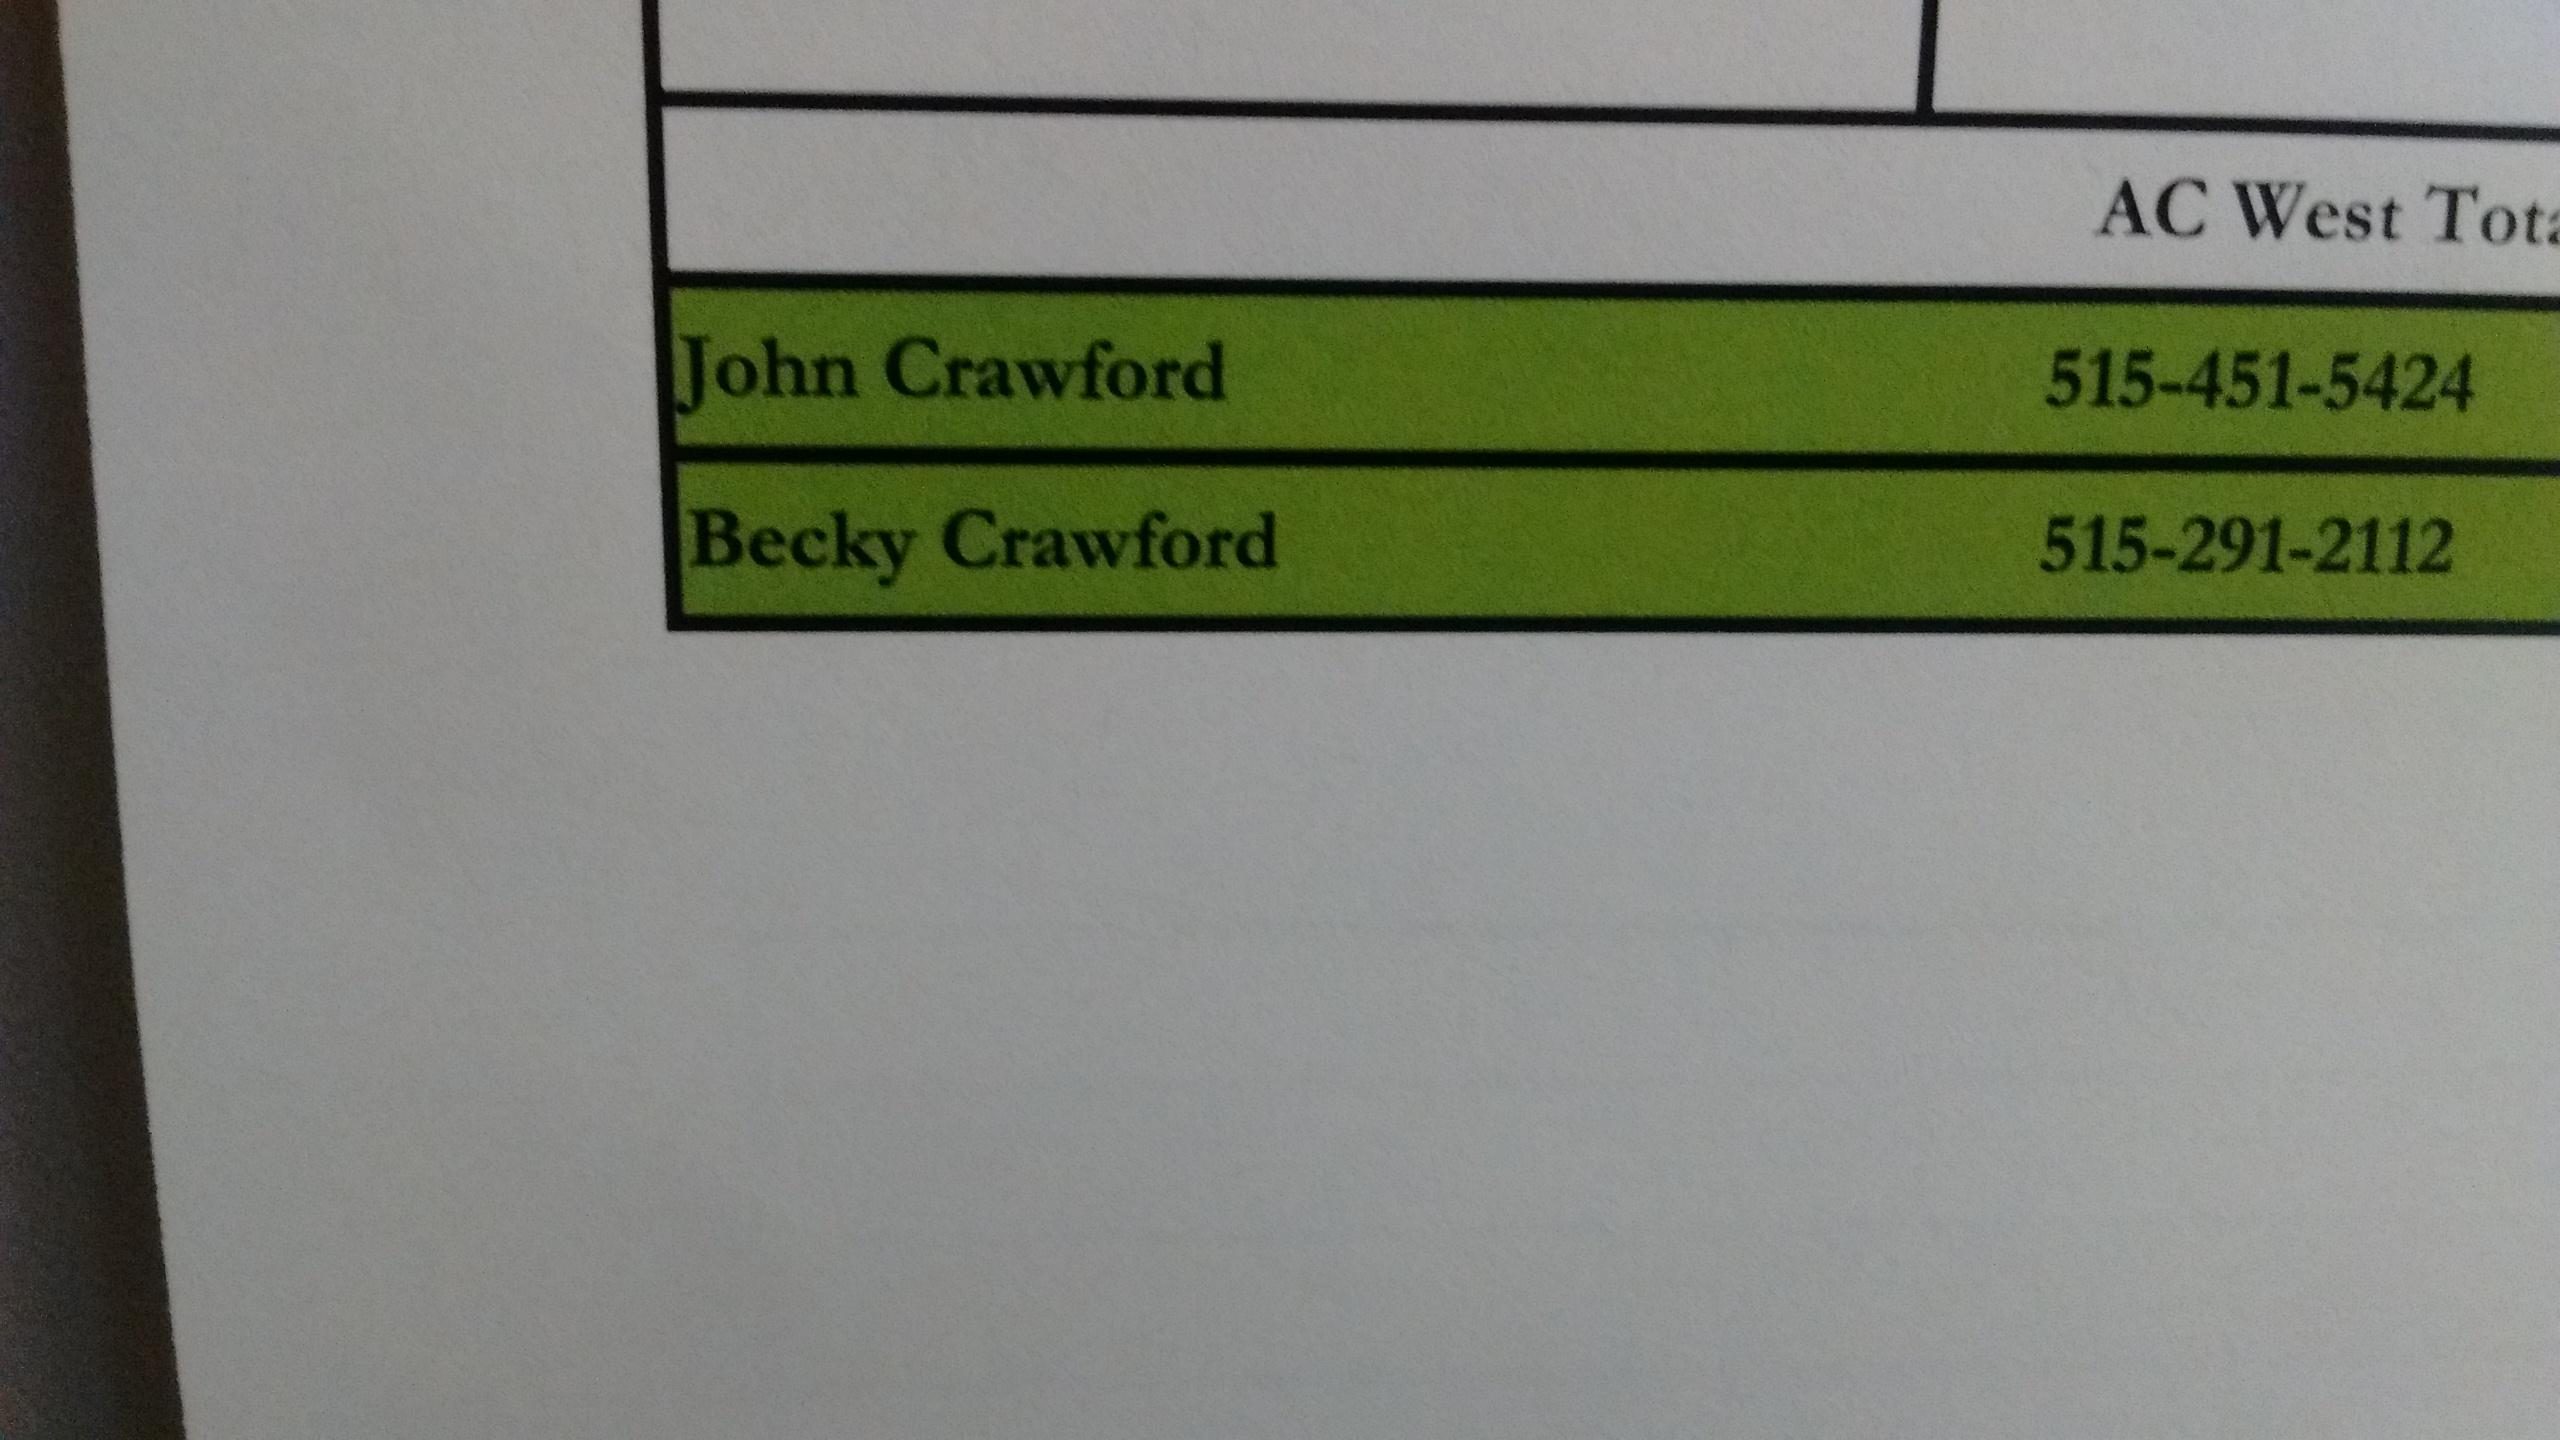 Becky Crawford